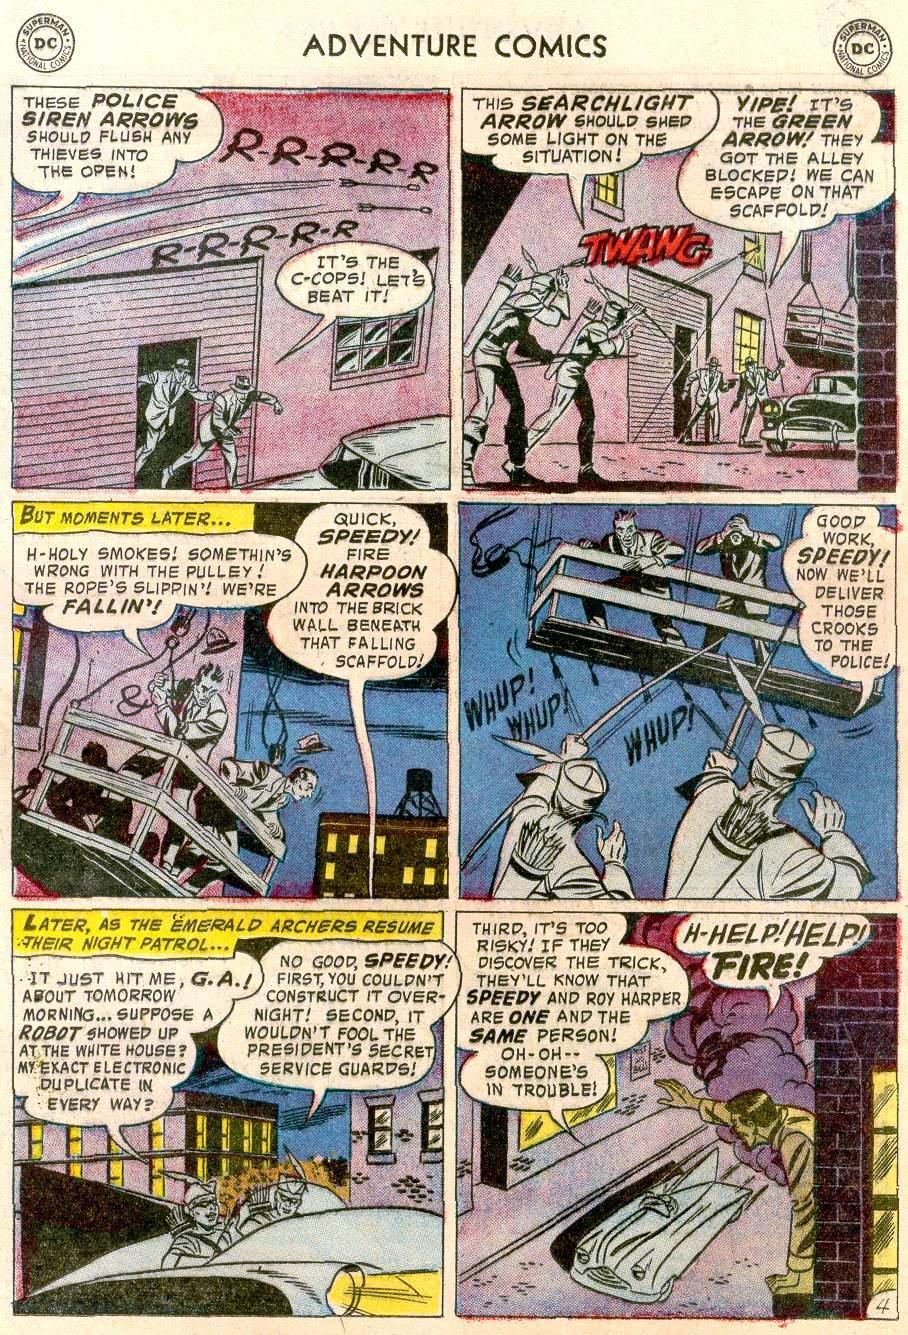 Read online Adventure Comics (1938) comic -  Issue #244 - 21